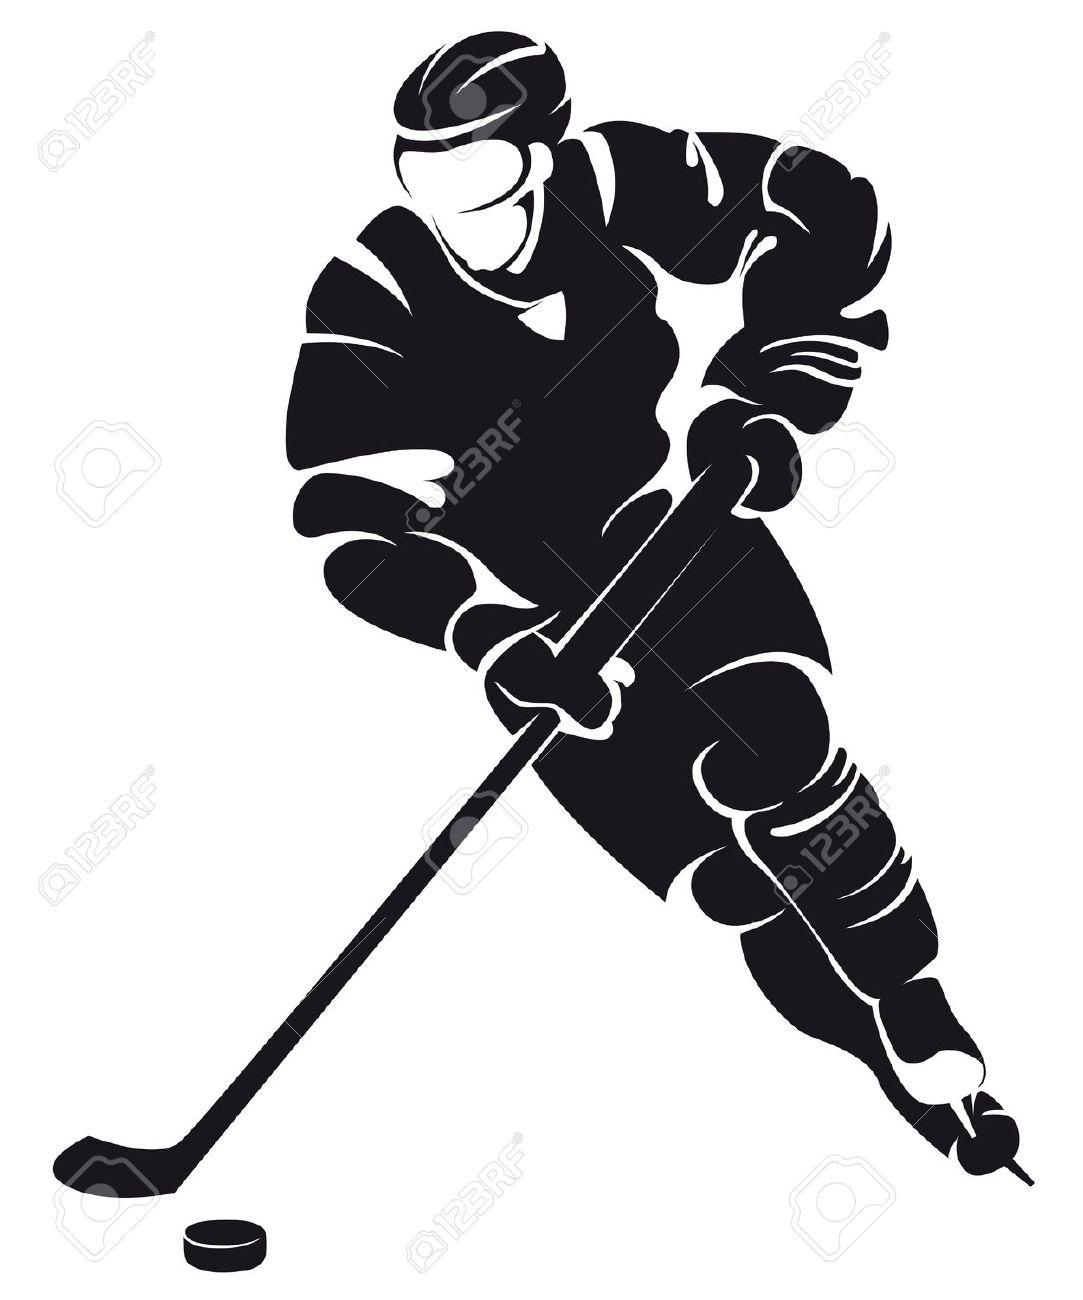 Hockey Player: Hockey Player, .-hockey player: hockey player, .-13